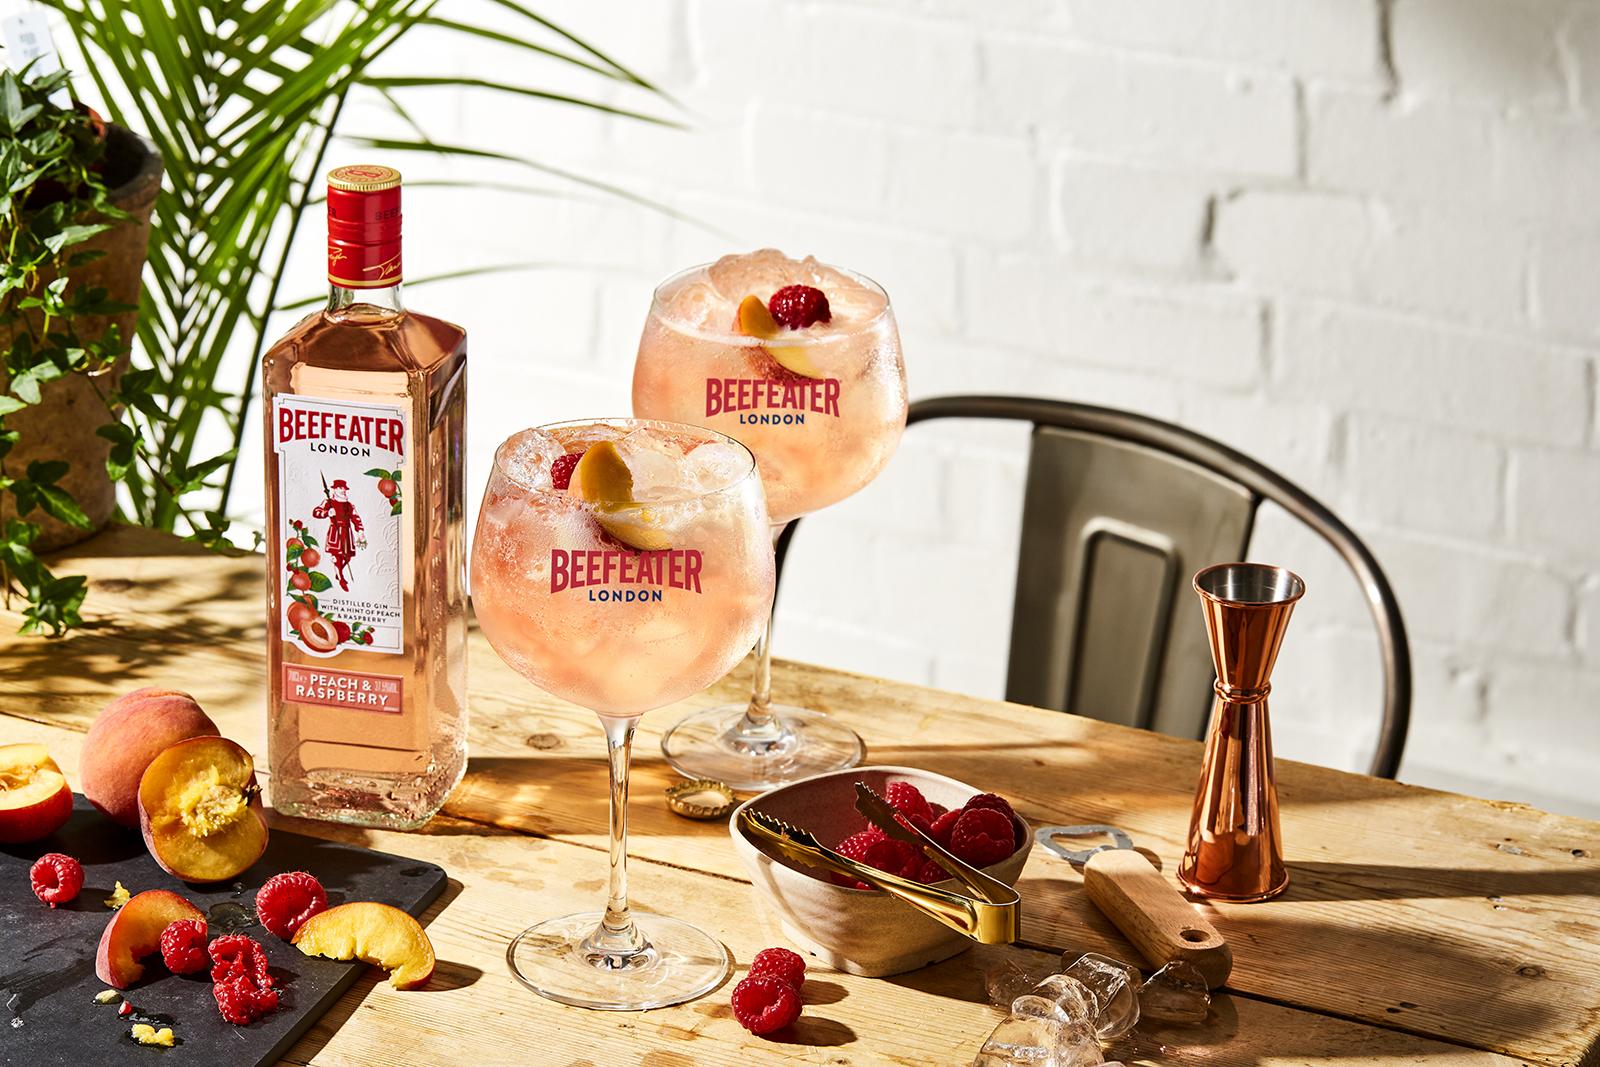 Beefeater Peach & Raspberry Gin serve